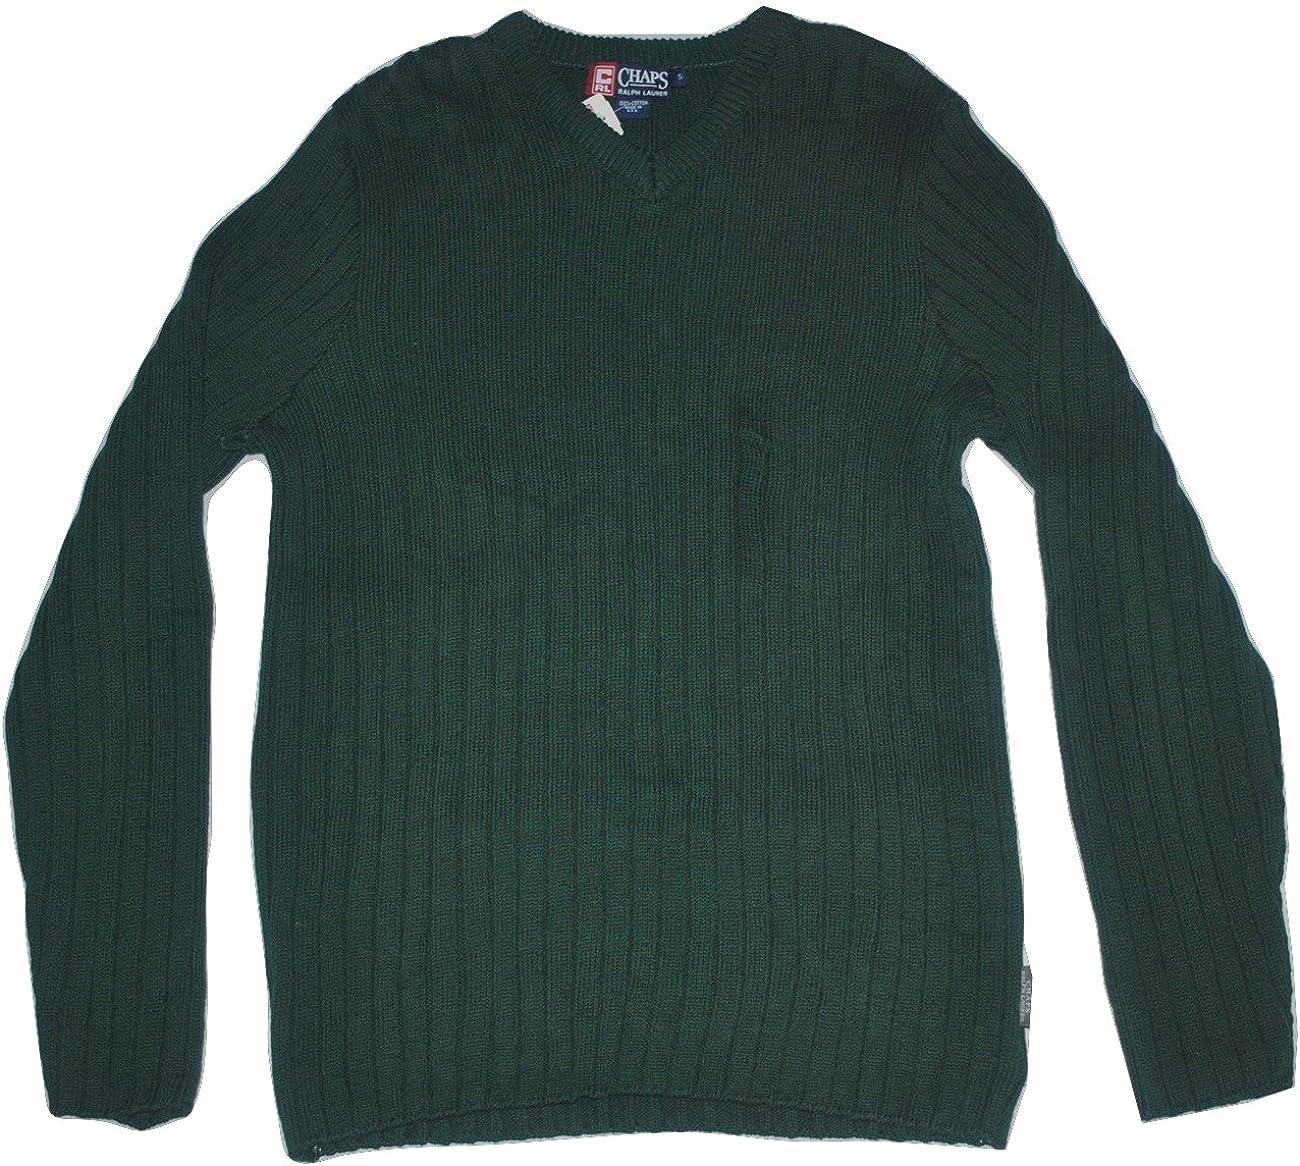 Max 78% OFF Chaps Ralph Lauren Men's V-Neck Small Fresno Mall Sweater Hunter Green